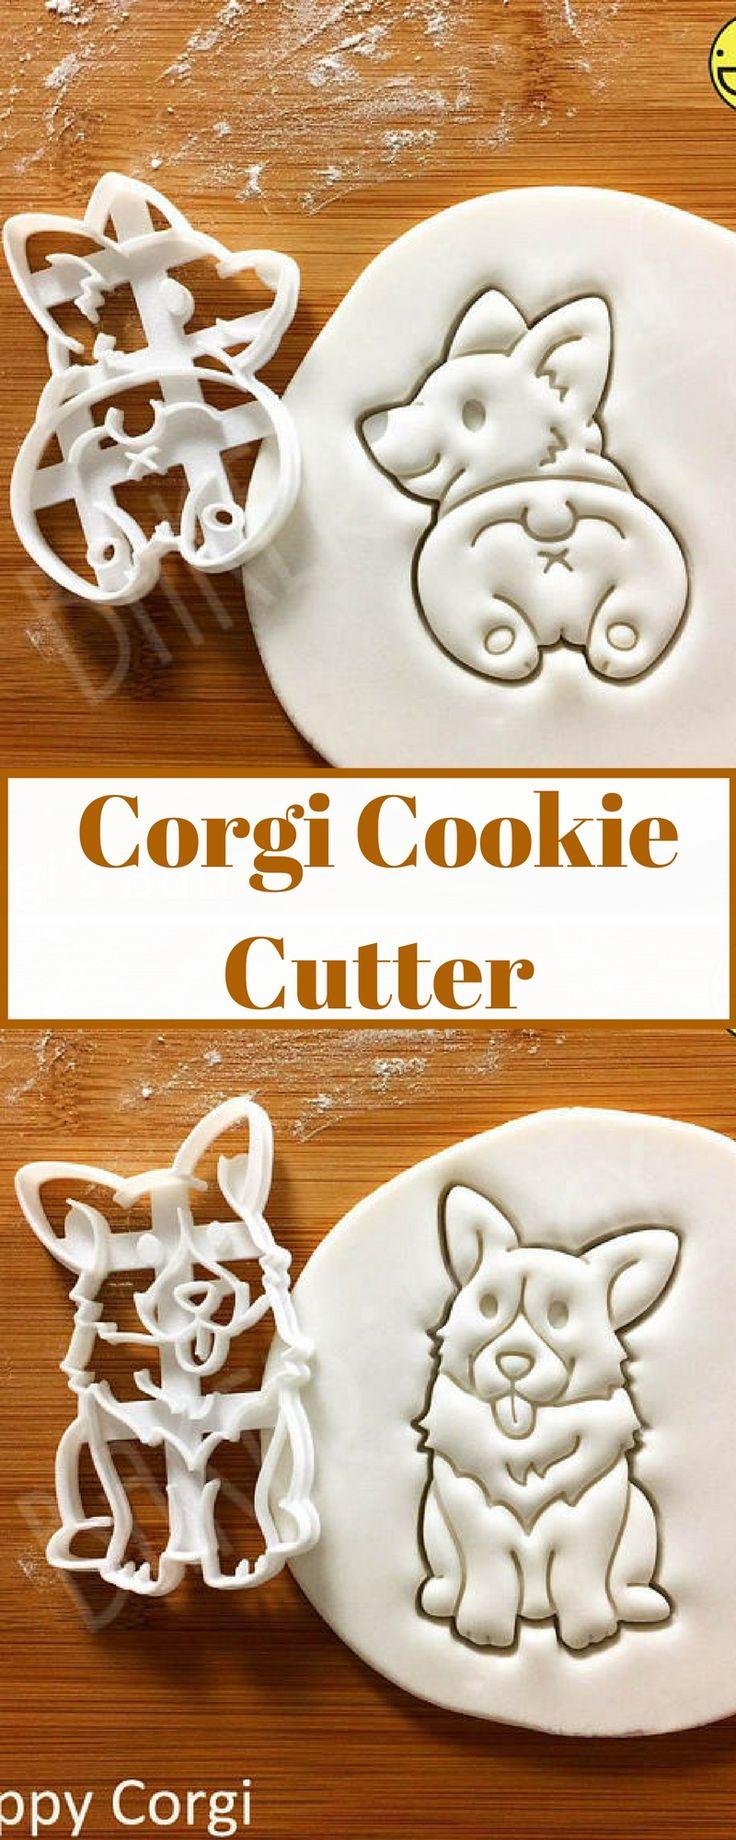 Corgi cookie cutter. #etsy #cookies #cookieart #corgi #affiliatelink